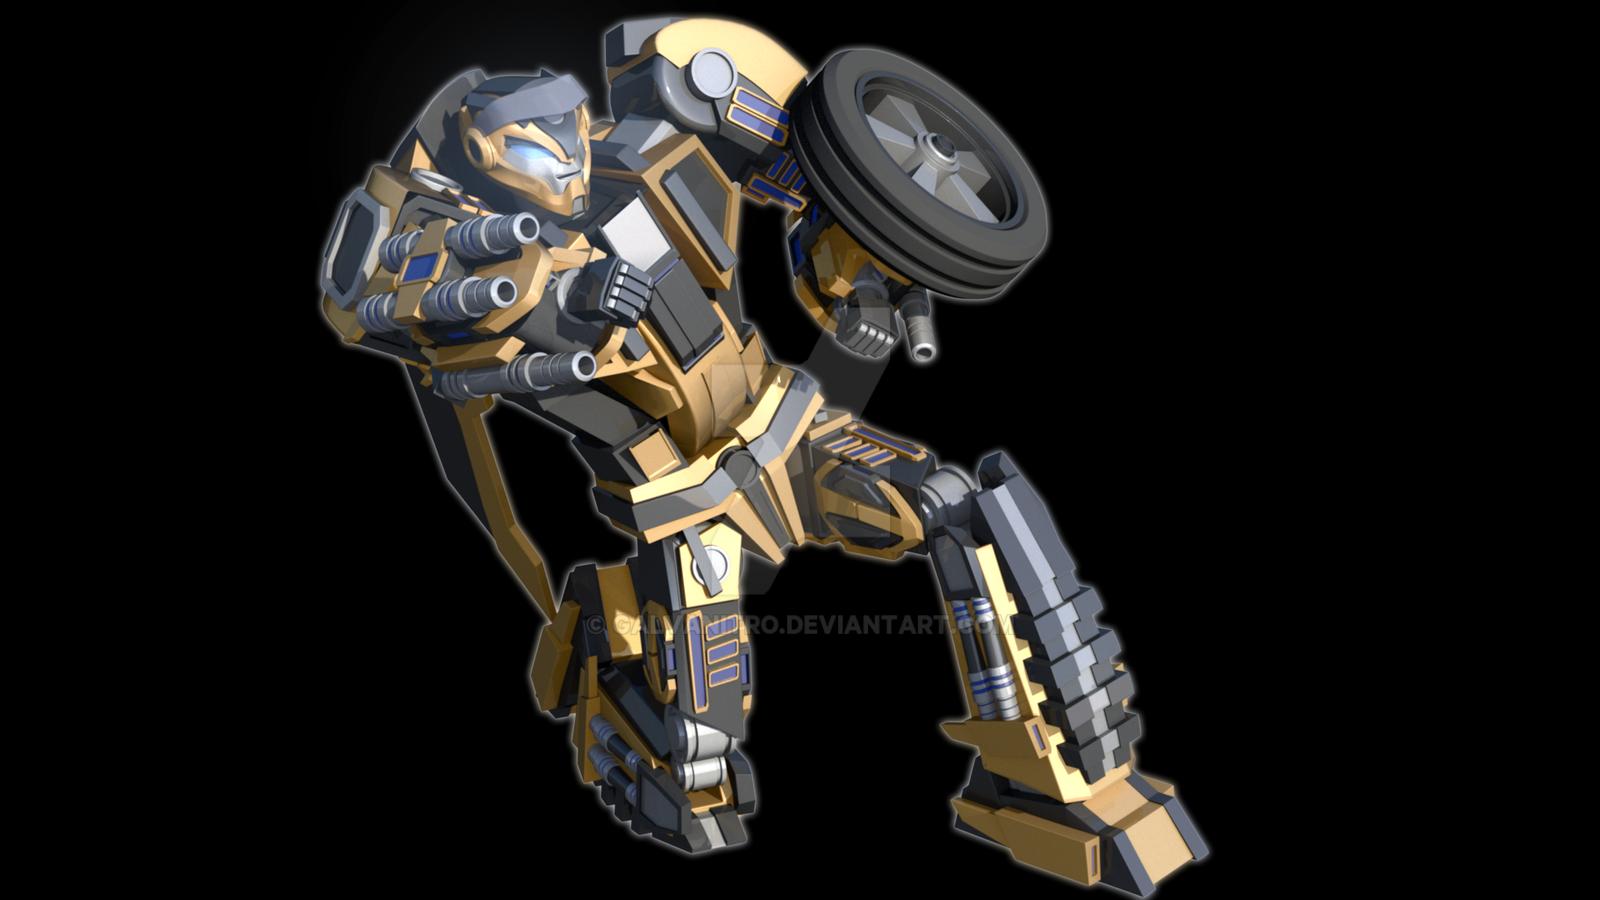 Destiny Bumblebee - Robot Mode #3 by Galvanitro on DeviantArt